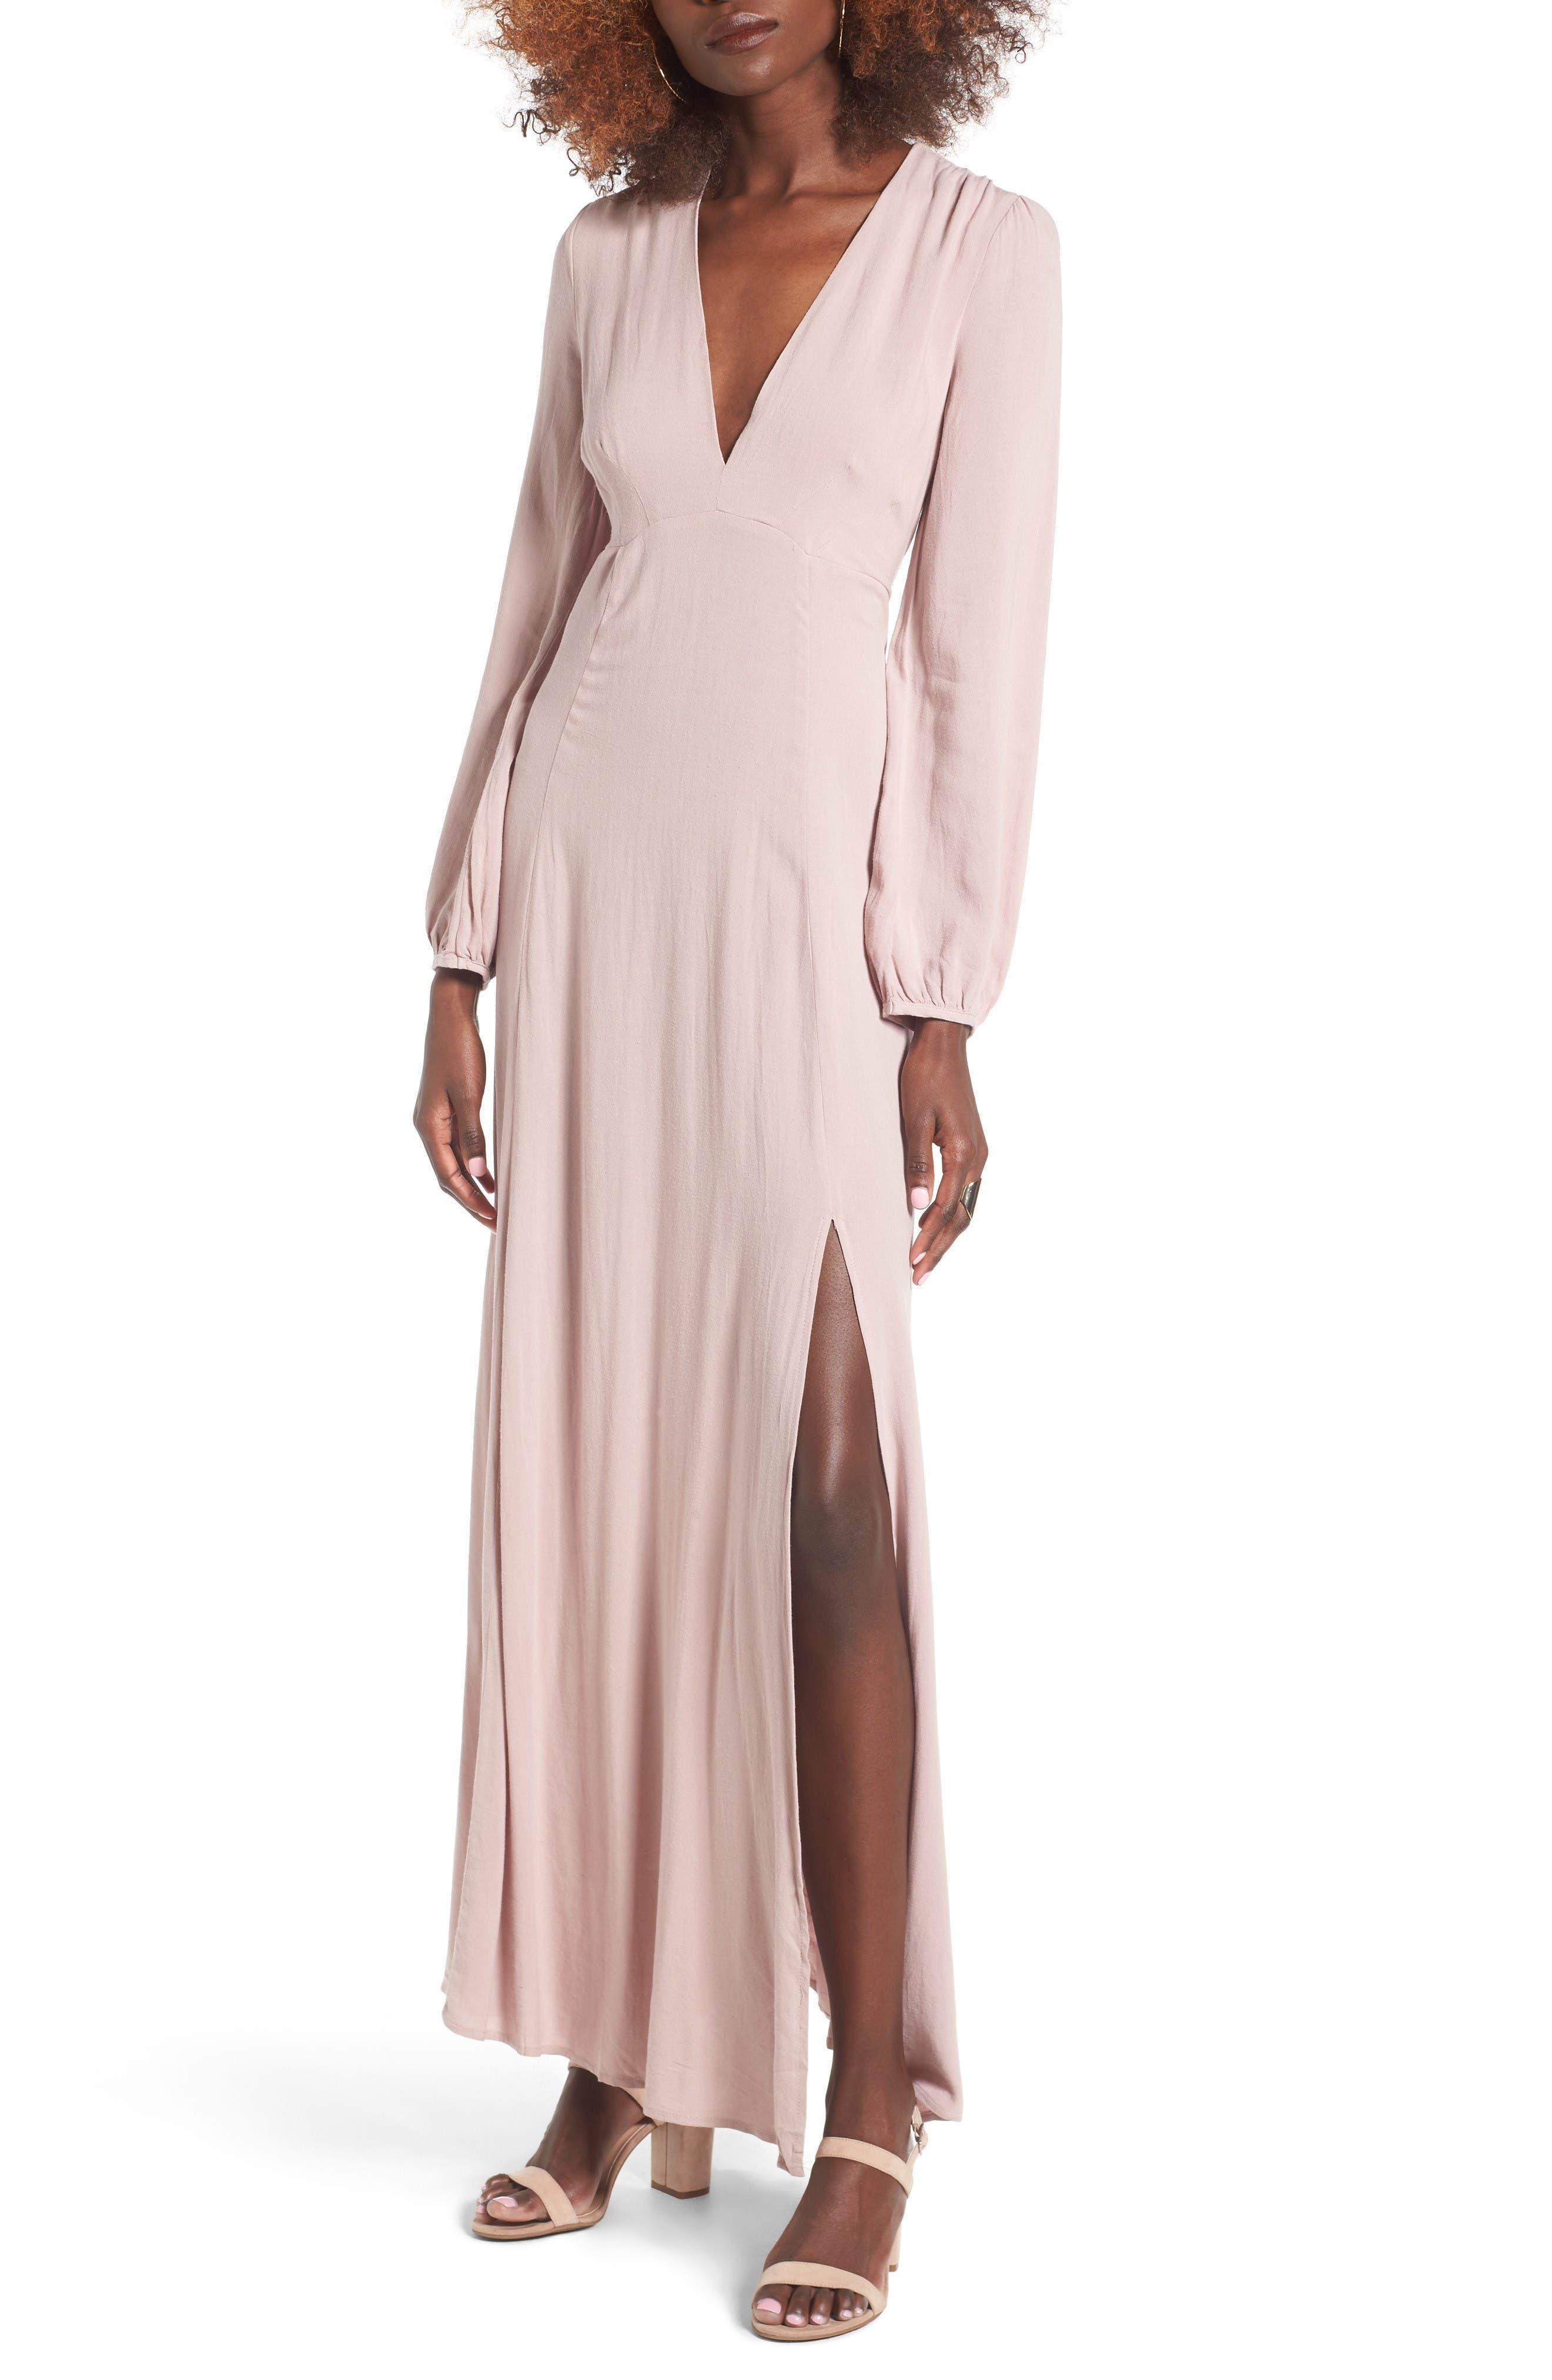 Alternate Image 1 Selected - Lush Open Back Woven Maxi Dress